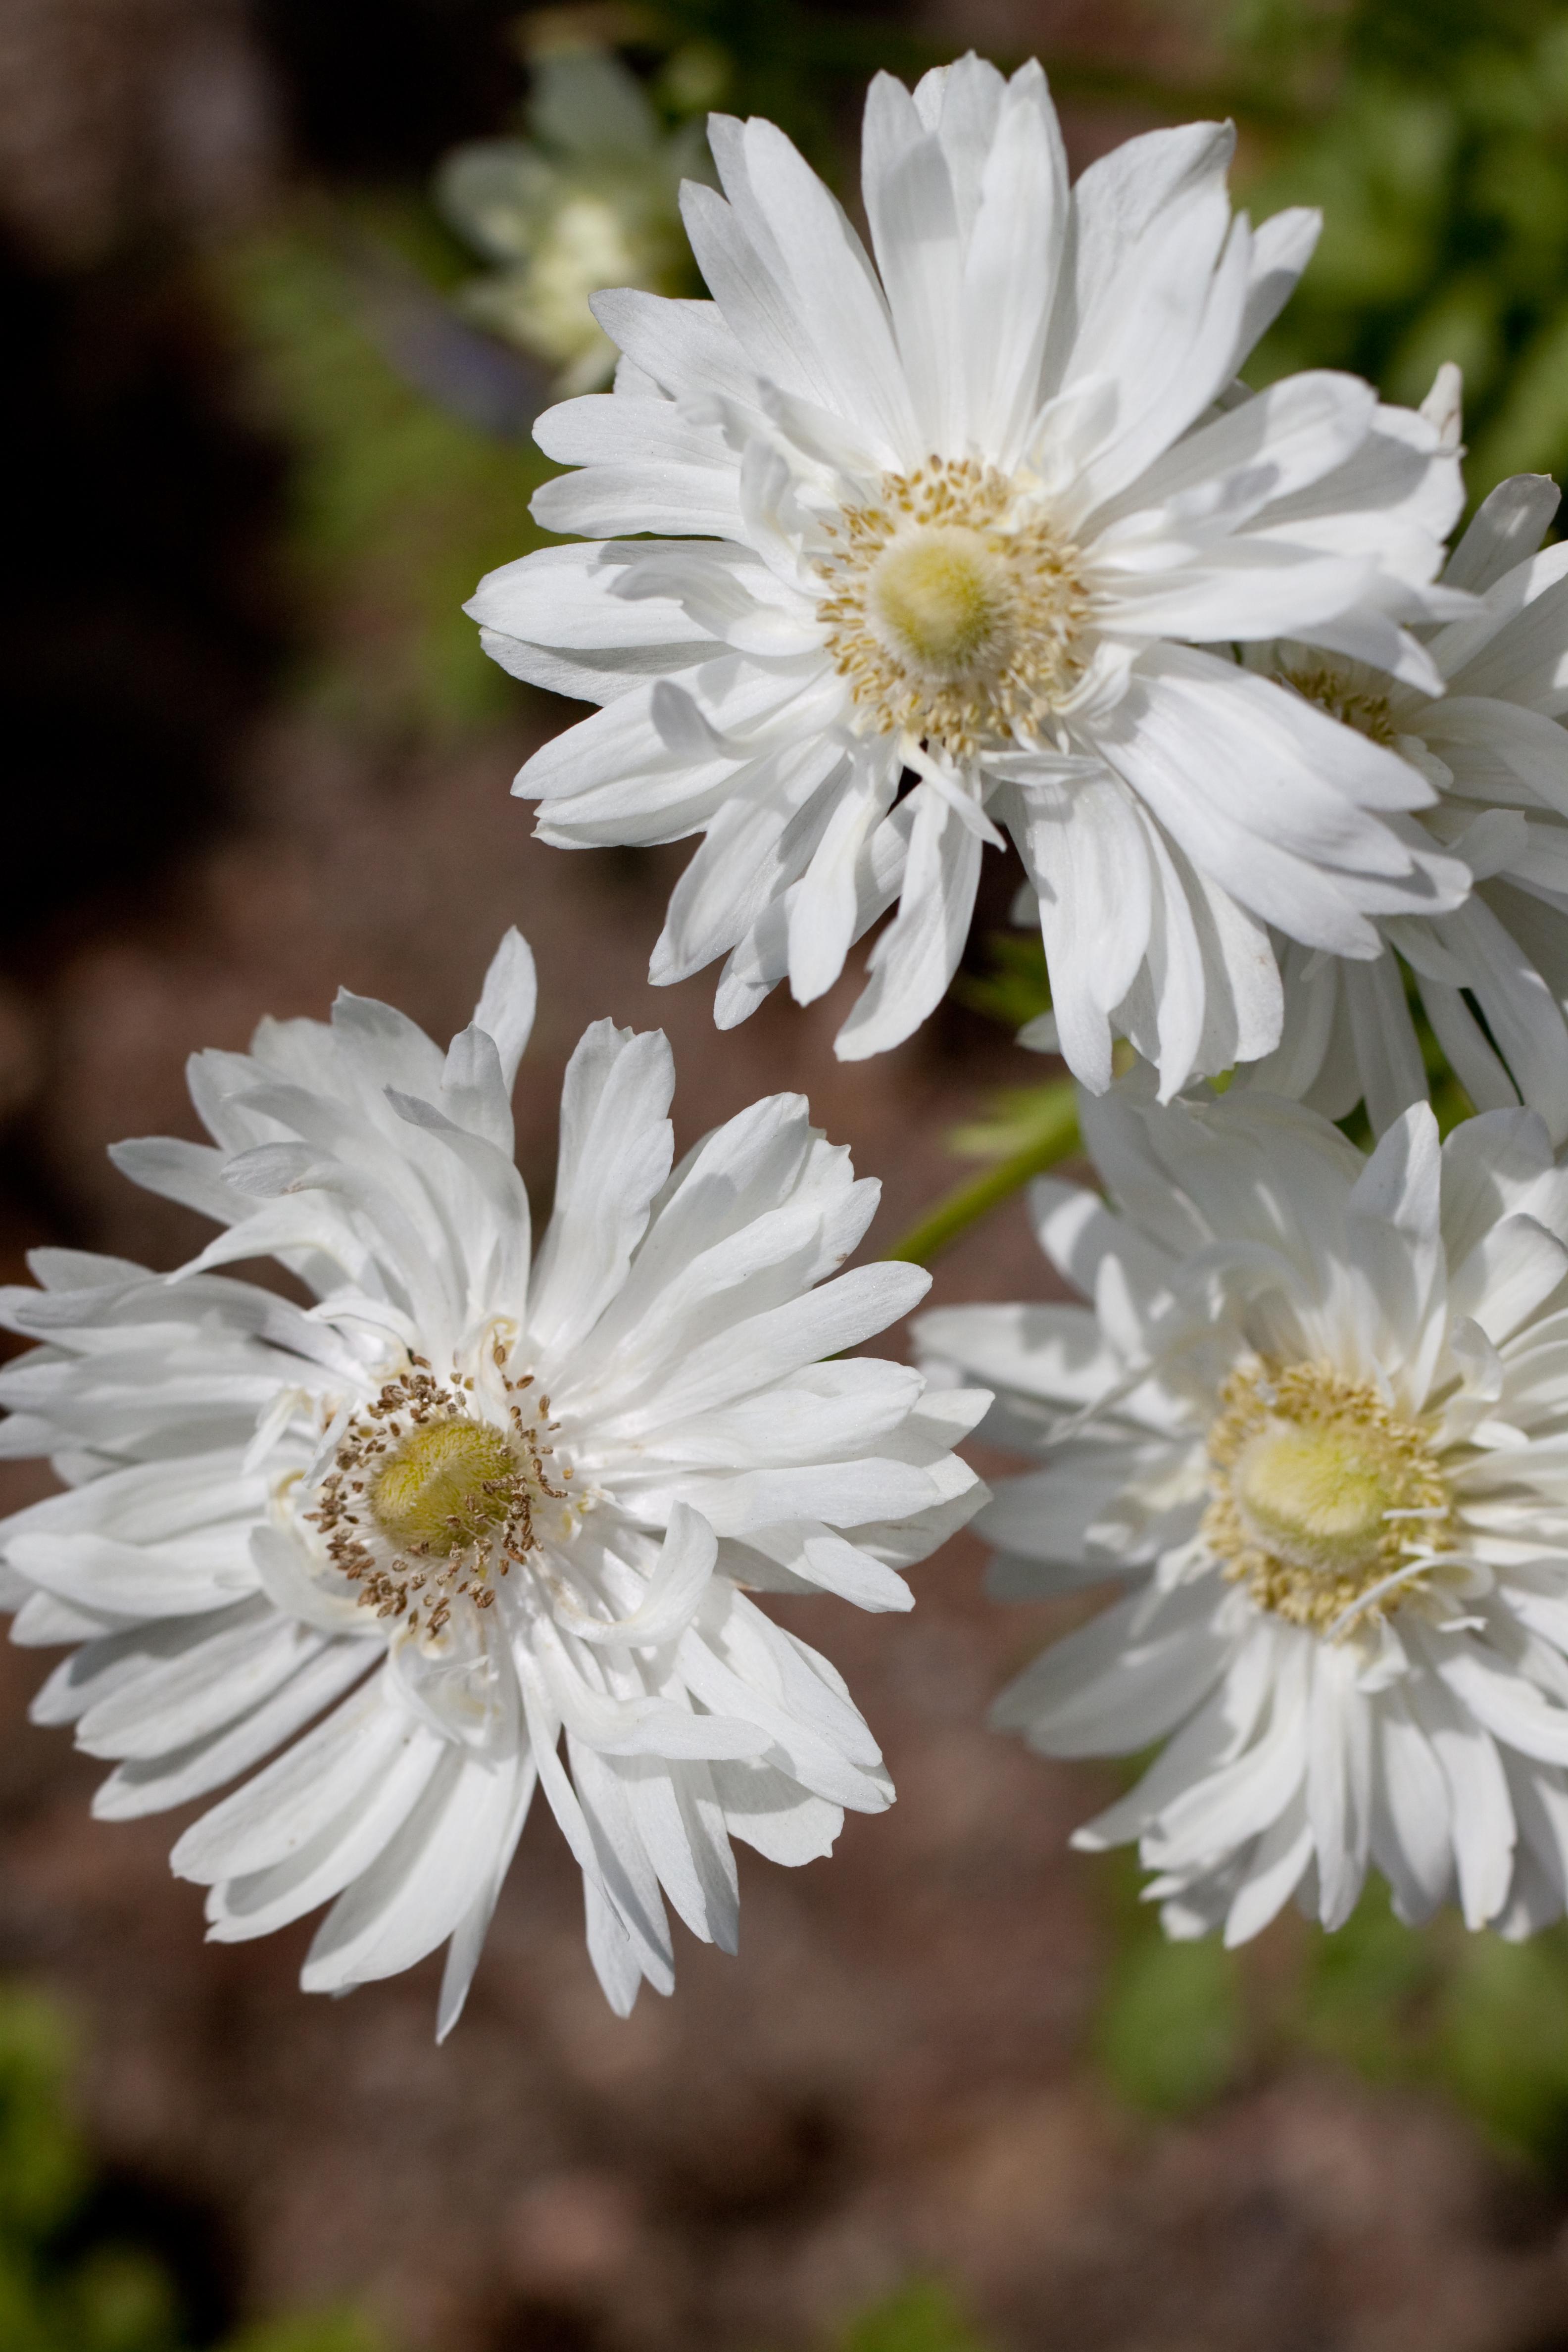 File Flower Anemone Flickr nekonomania 4 Wikimedia mons